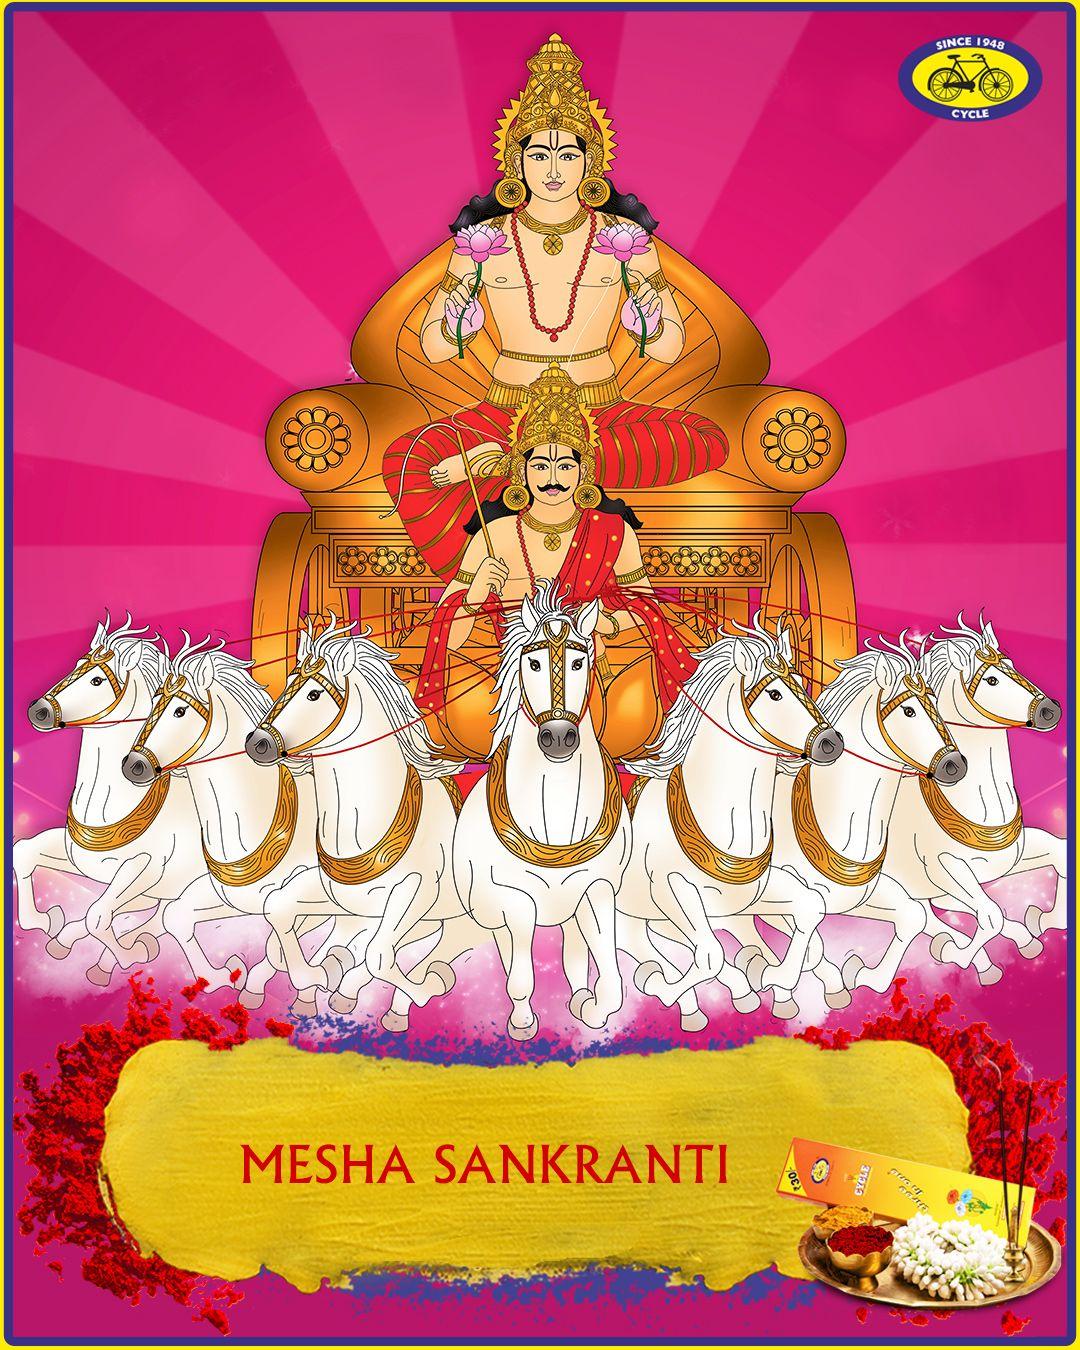 Mesha Sankranti In 2020 Pure Products Hindu Gods Durga Goddess